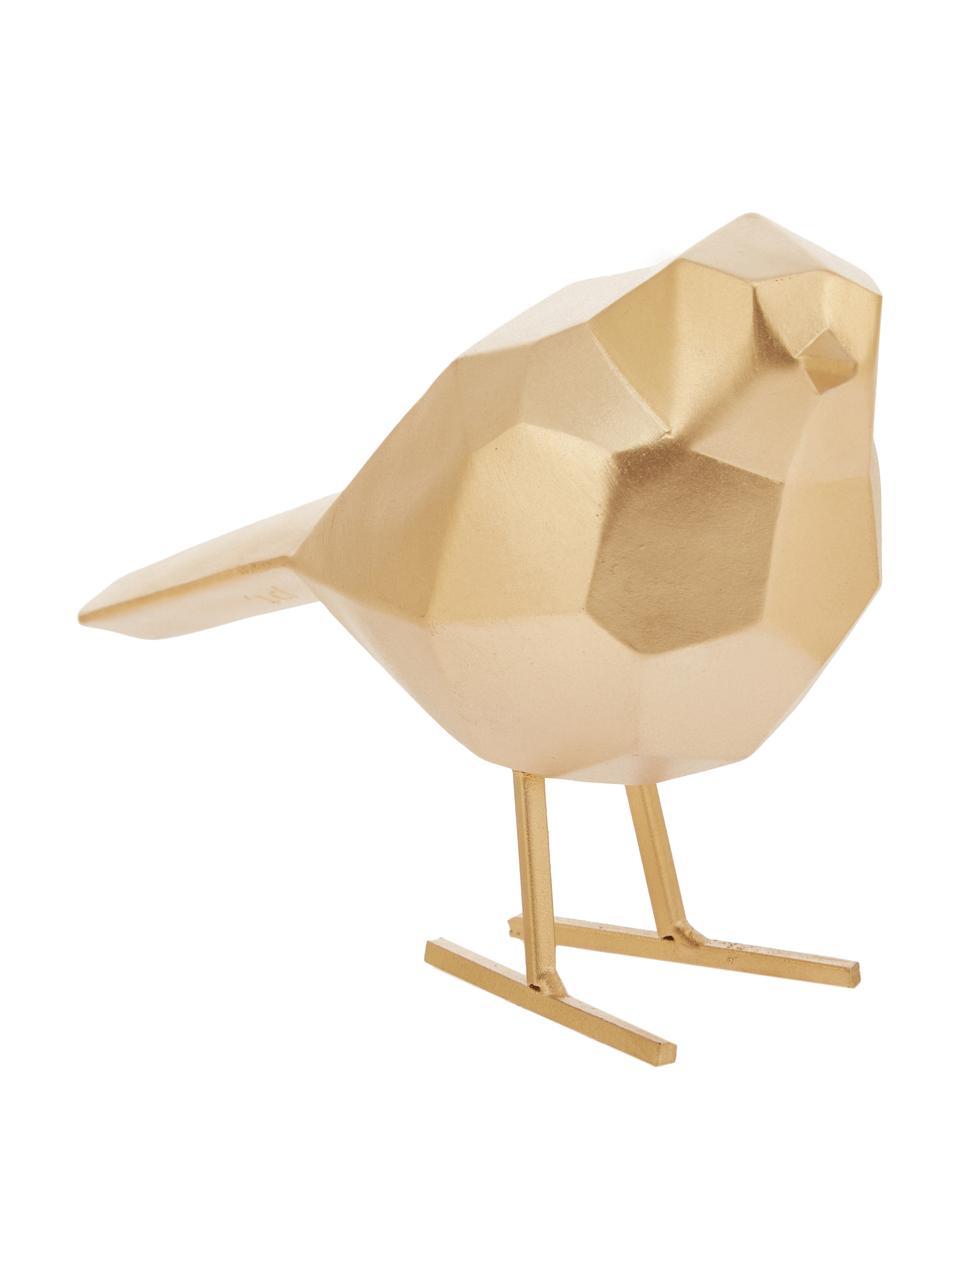 Deko-Objekt Bird, Polyresin, Goldfarben, 17 x 14 cm